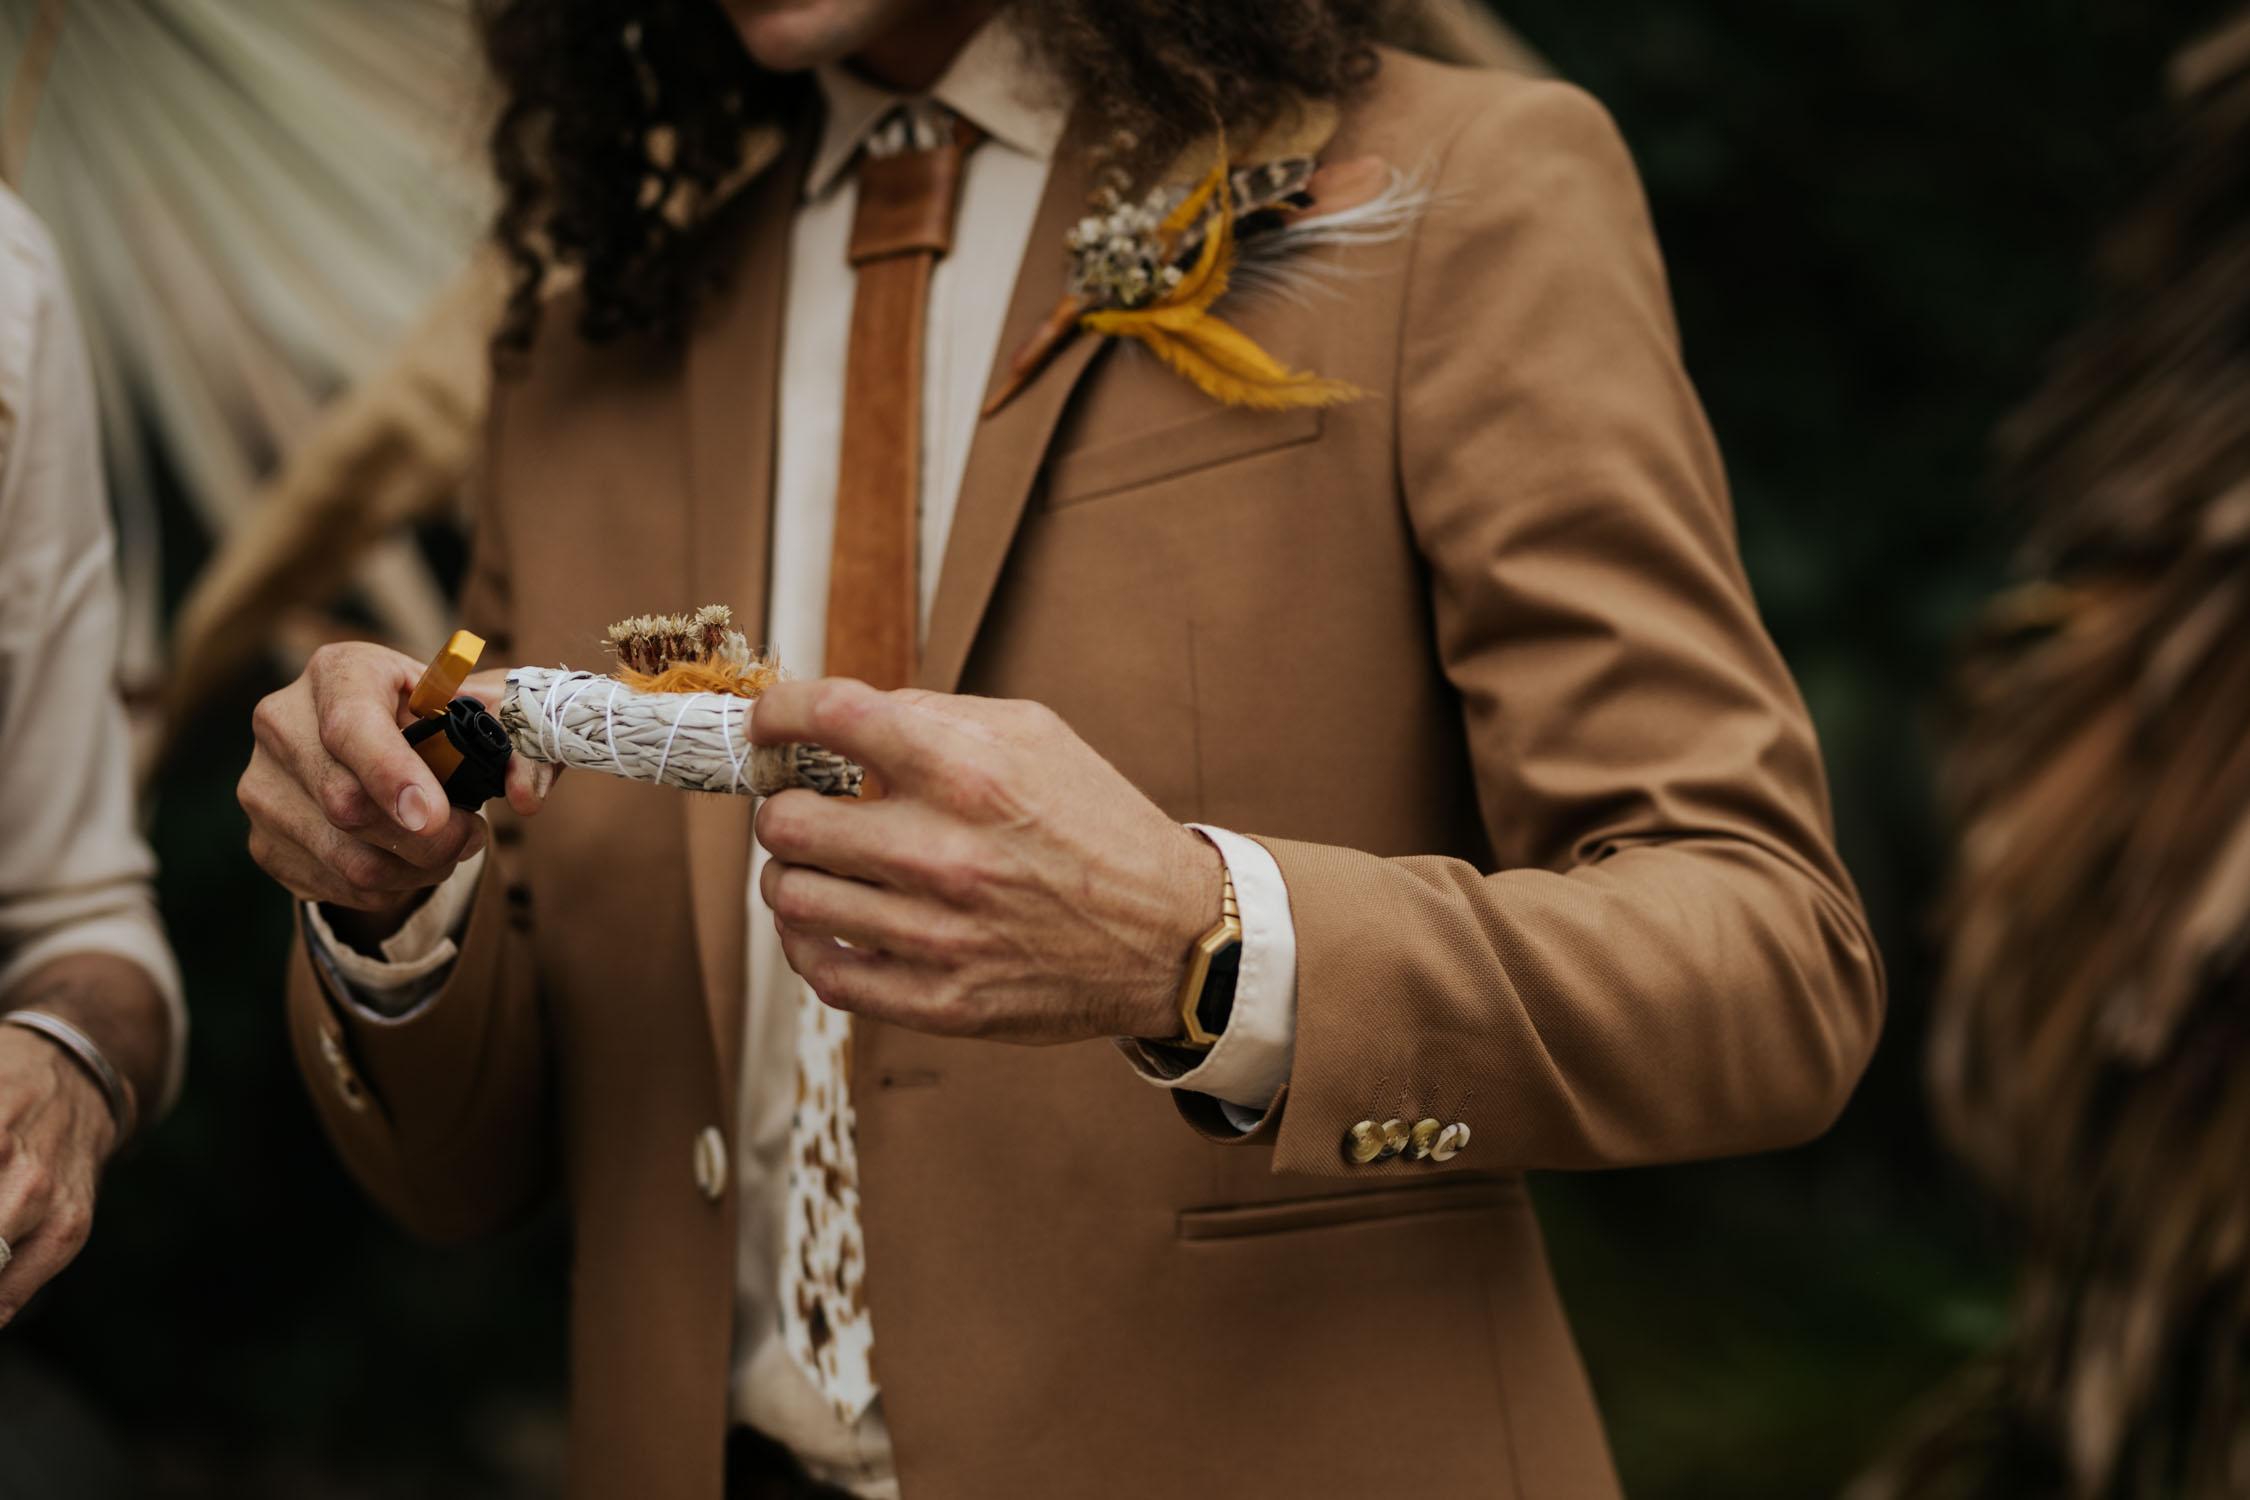 Untraditional sacred sage smudging sticks at boho gypsy wedding ceremony